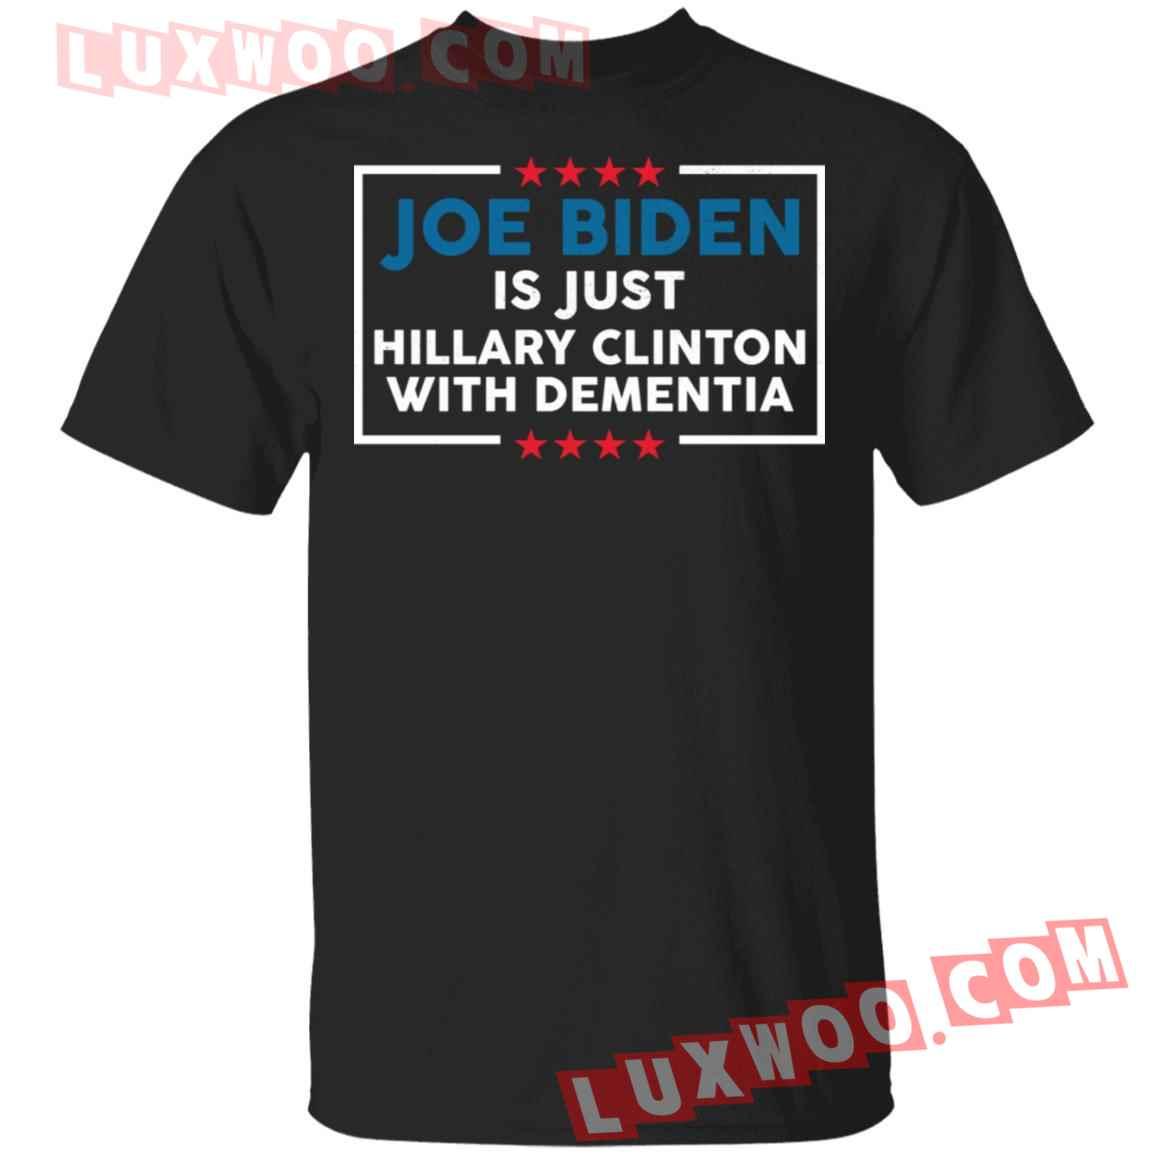 Joe Biden Is Just Hillary Clinton With Dementia Shirt